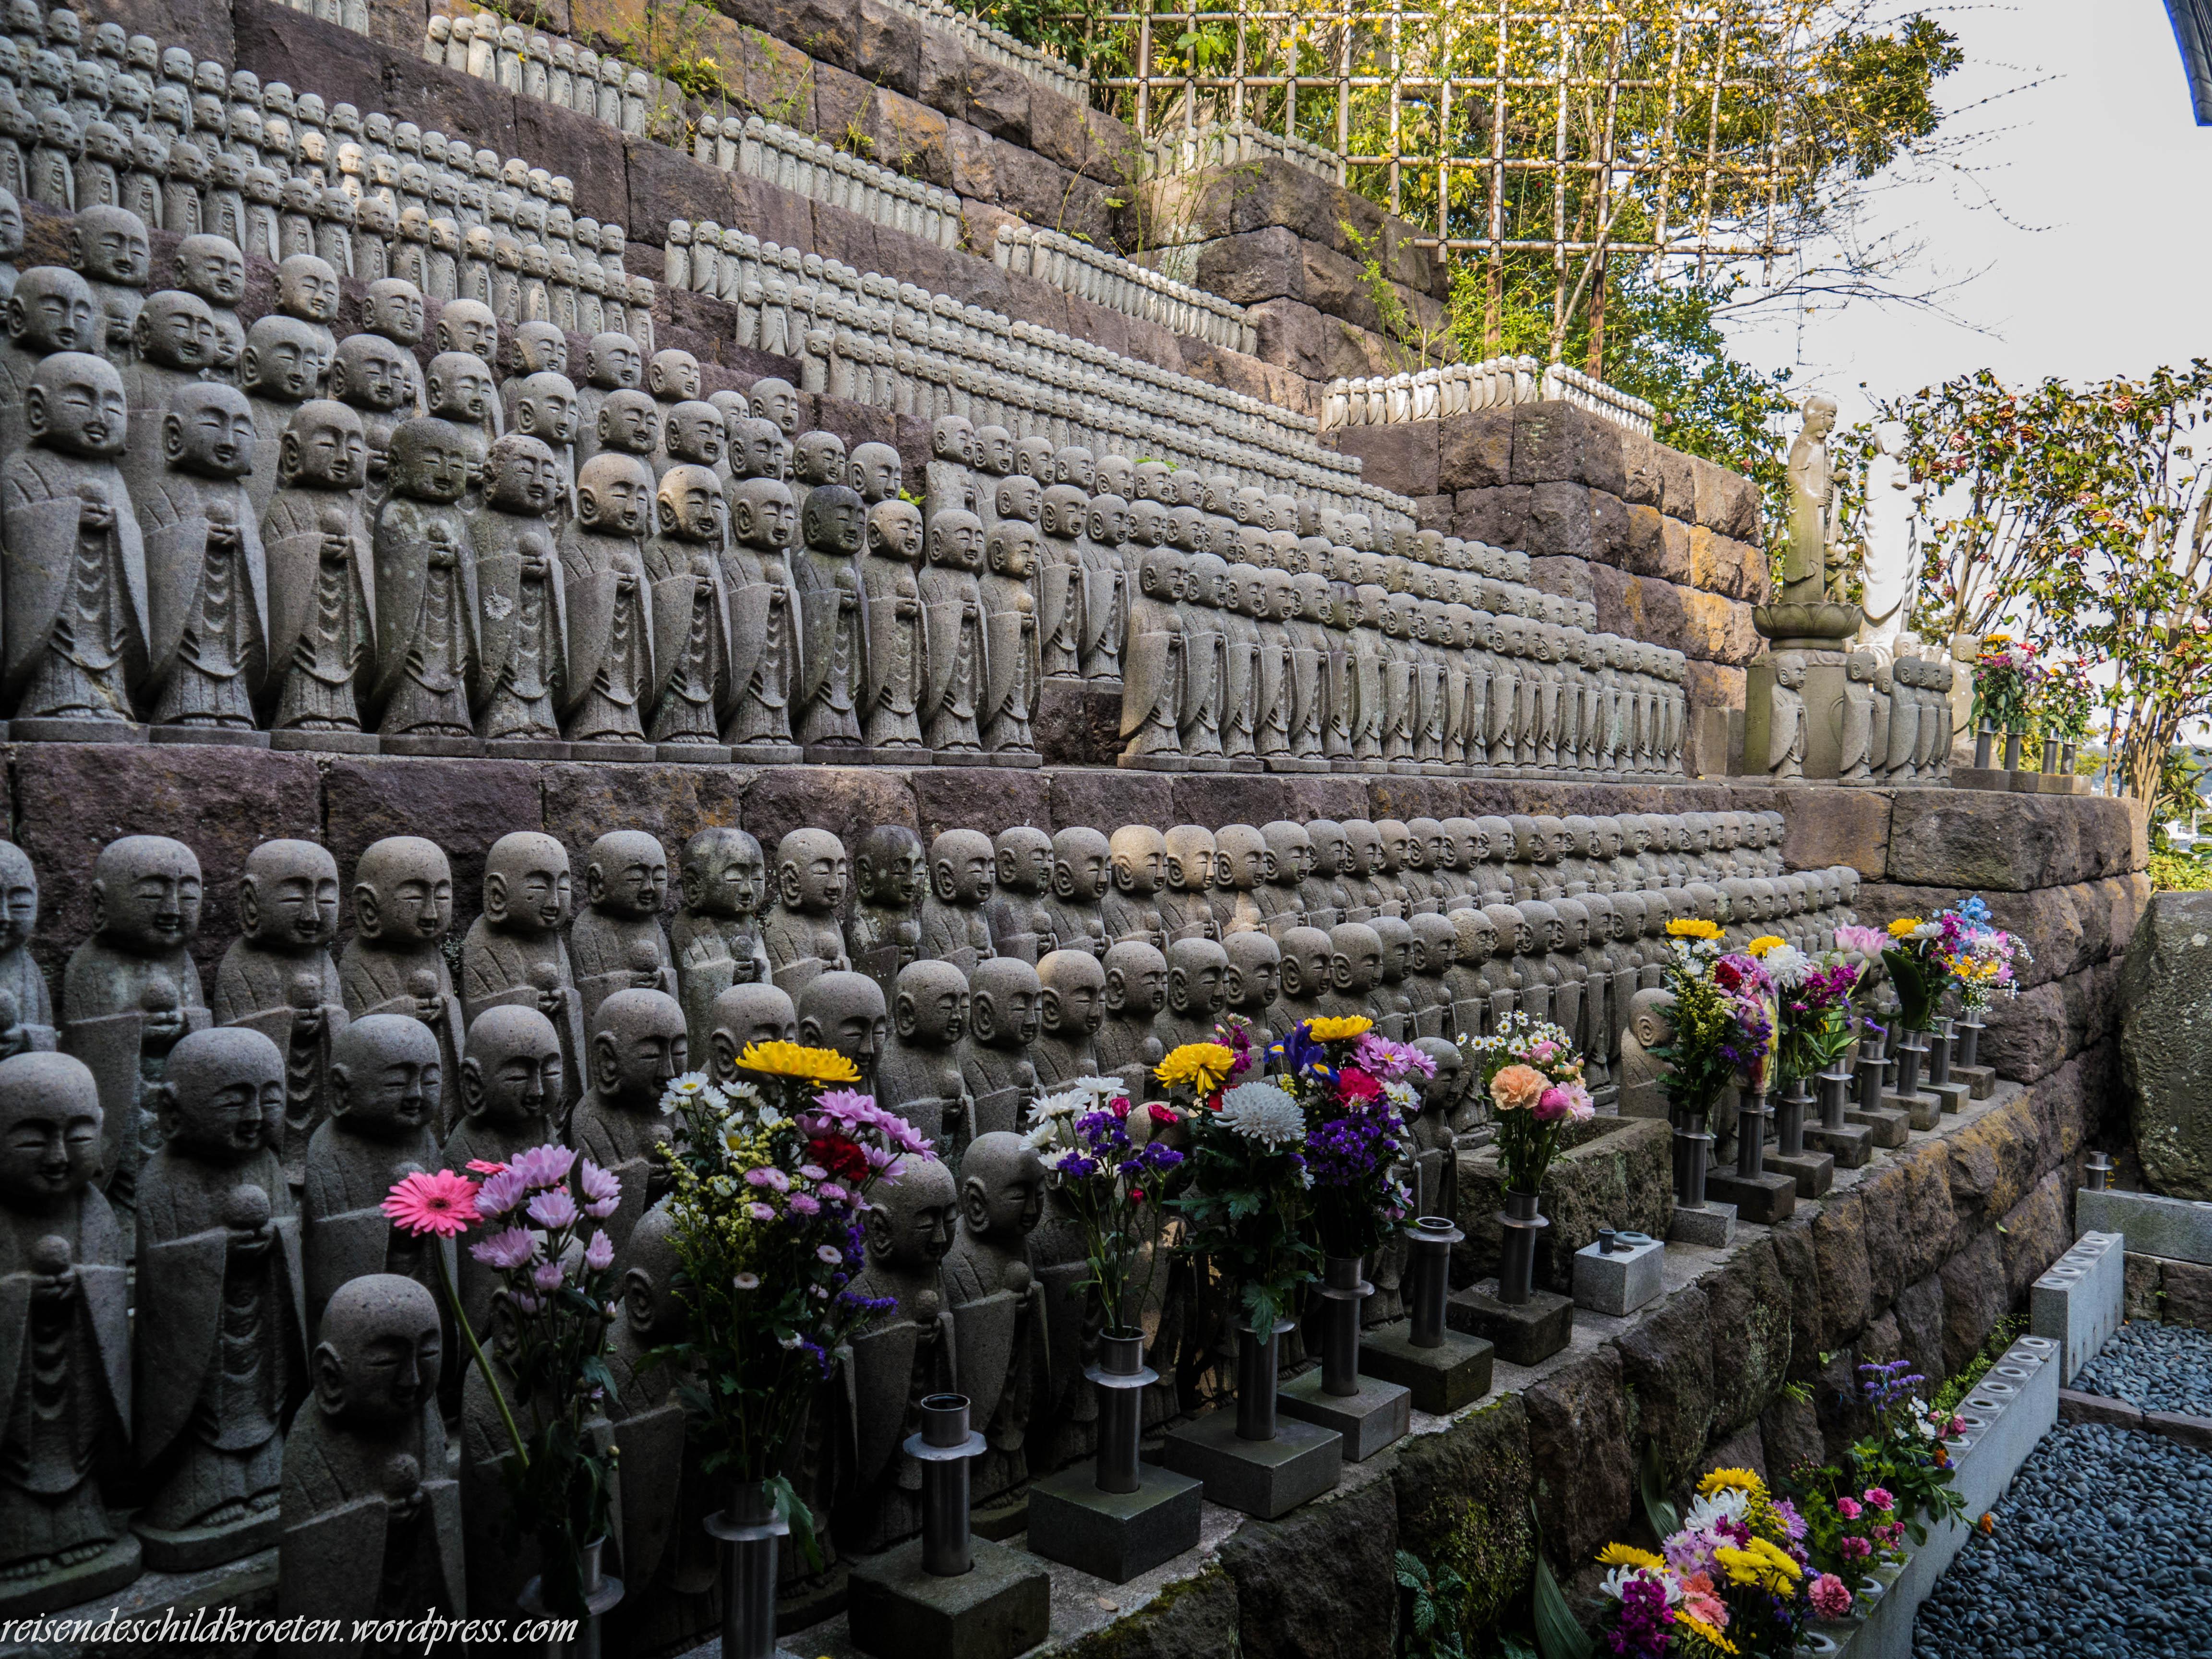 Jizō statues in Hase-dera